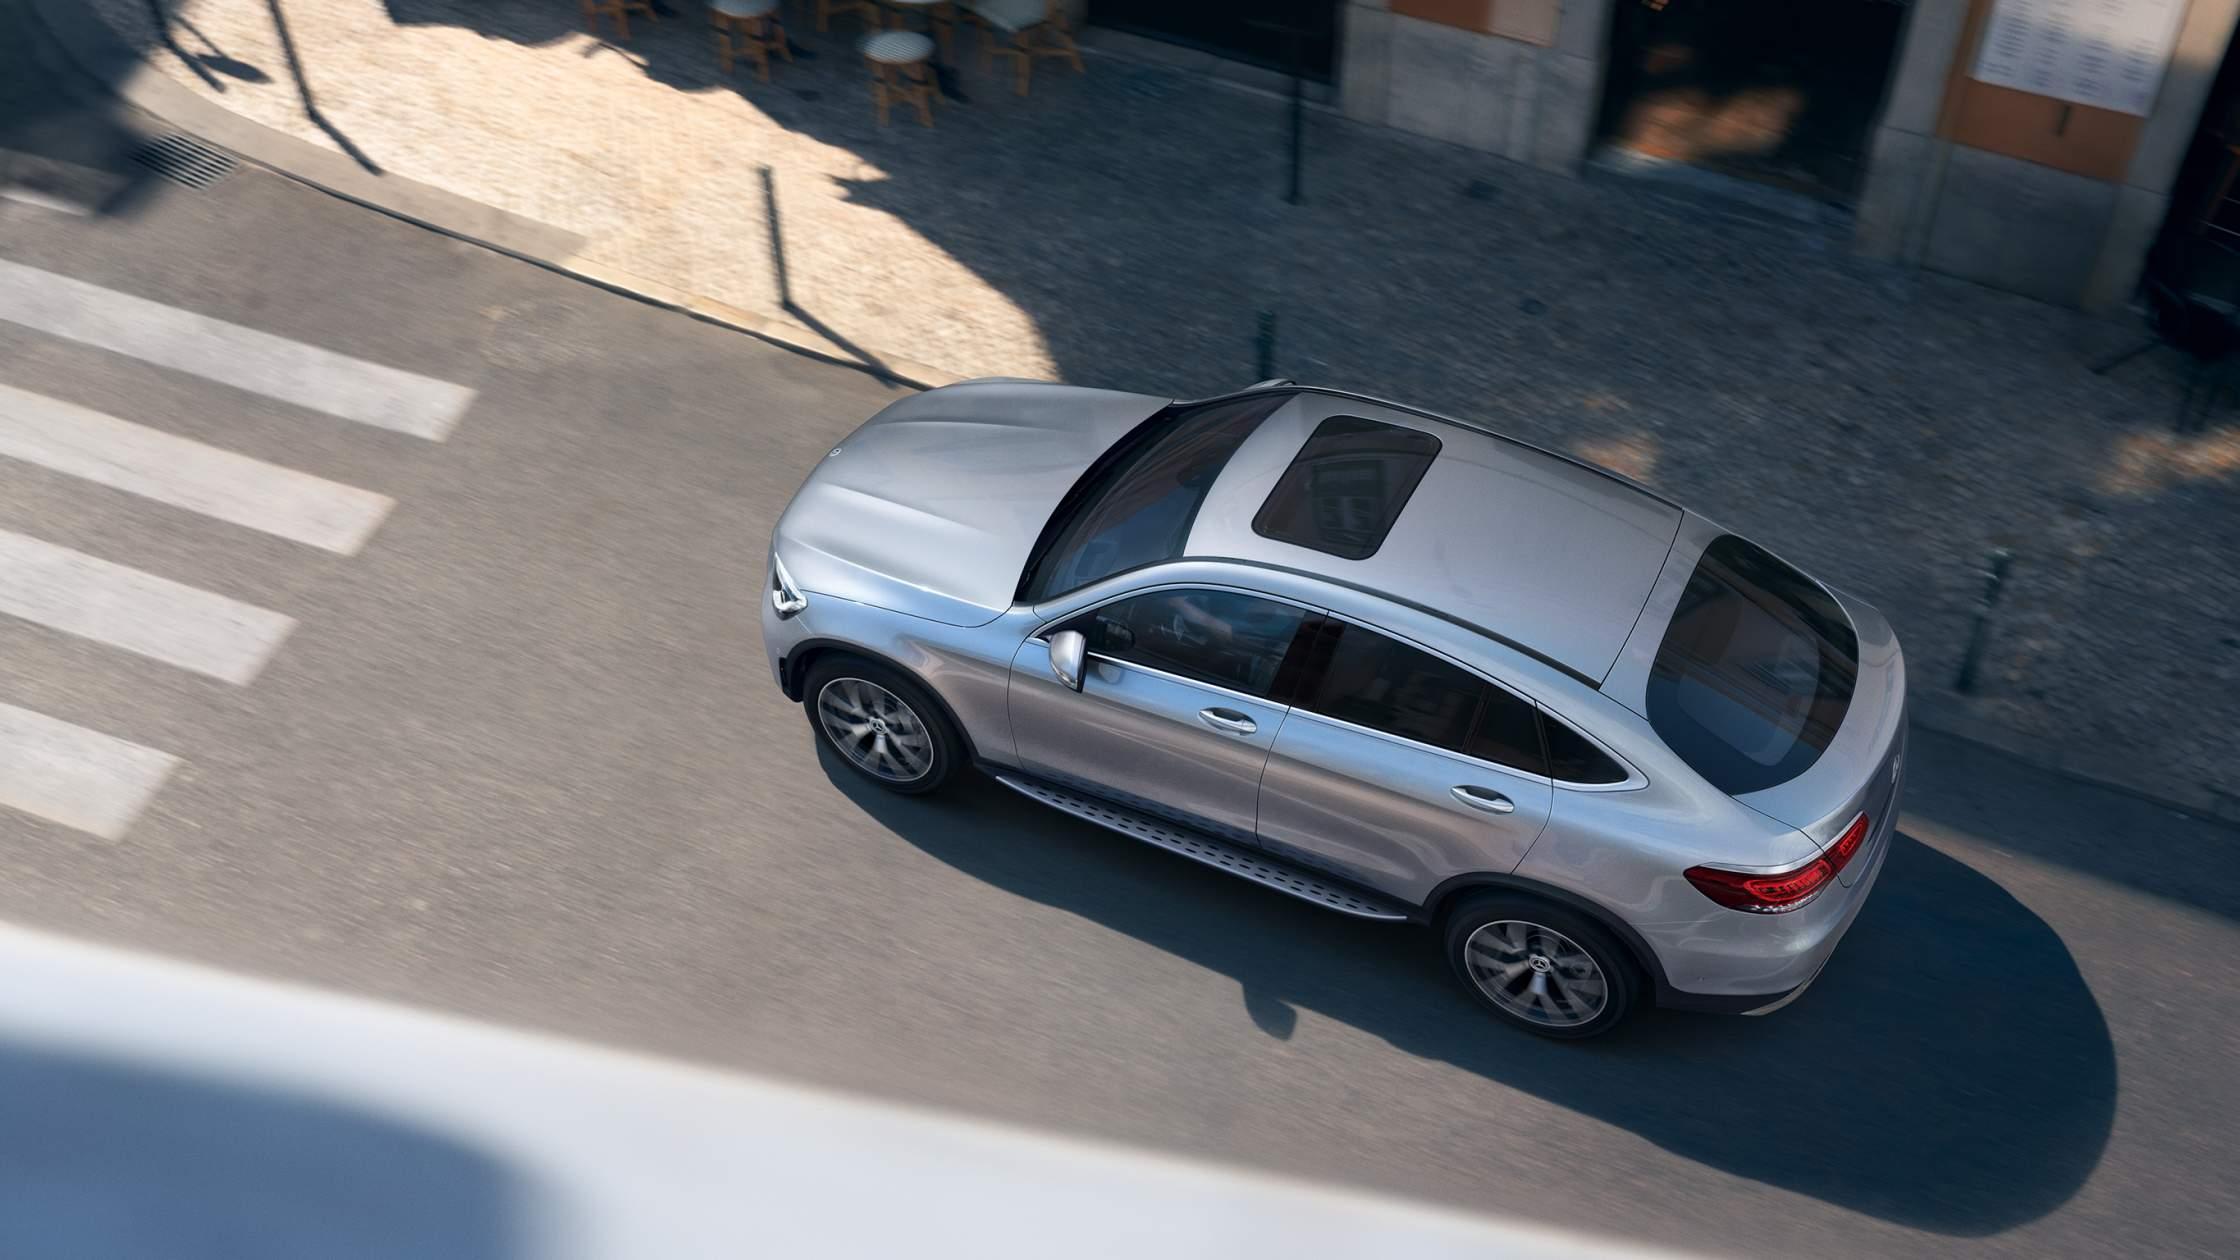 CAR-Avenue-Mercedes-Benz-GLC-Coupe-SUV-01